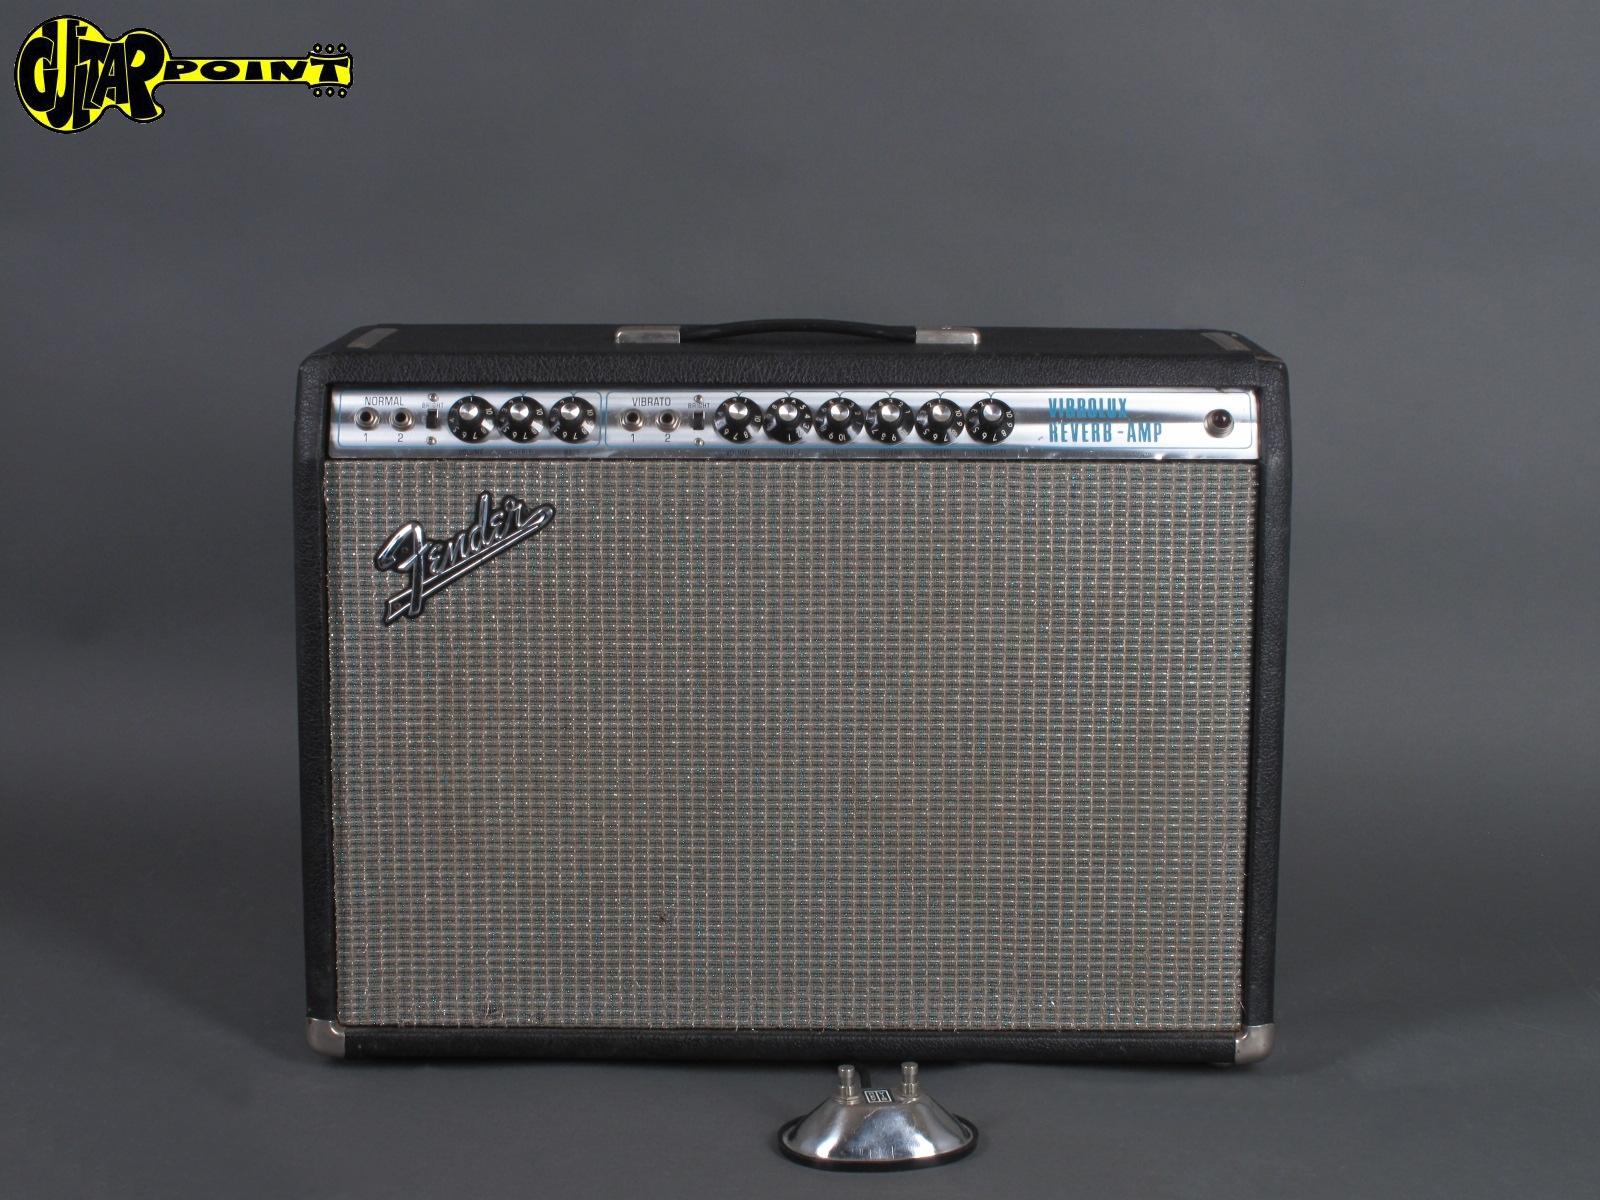 1970 Fender Vibrolux Reverb Amp  ...Mint !